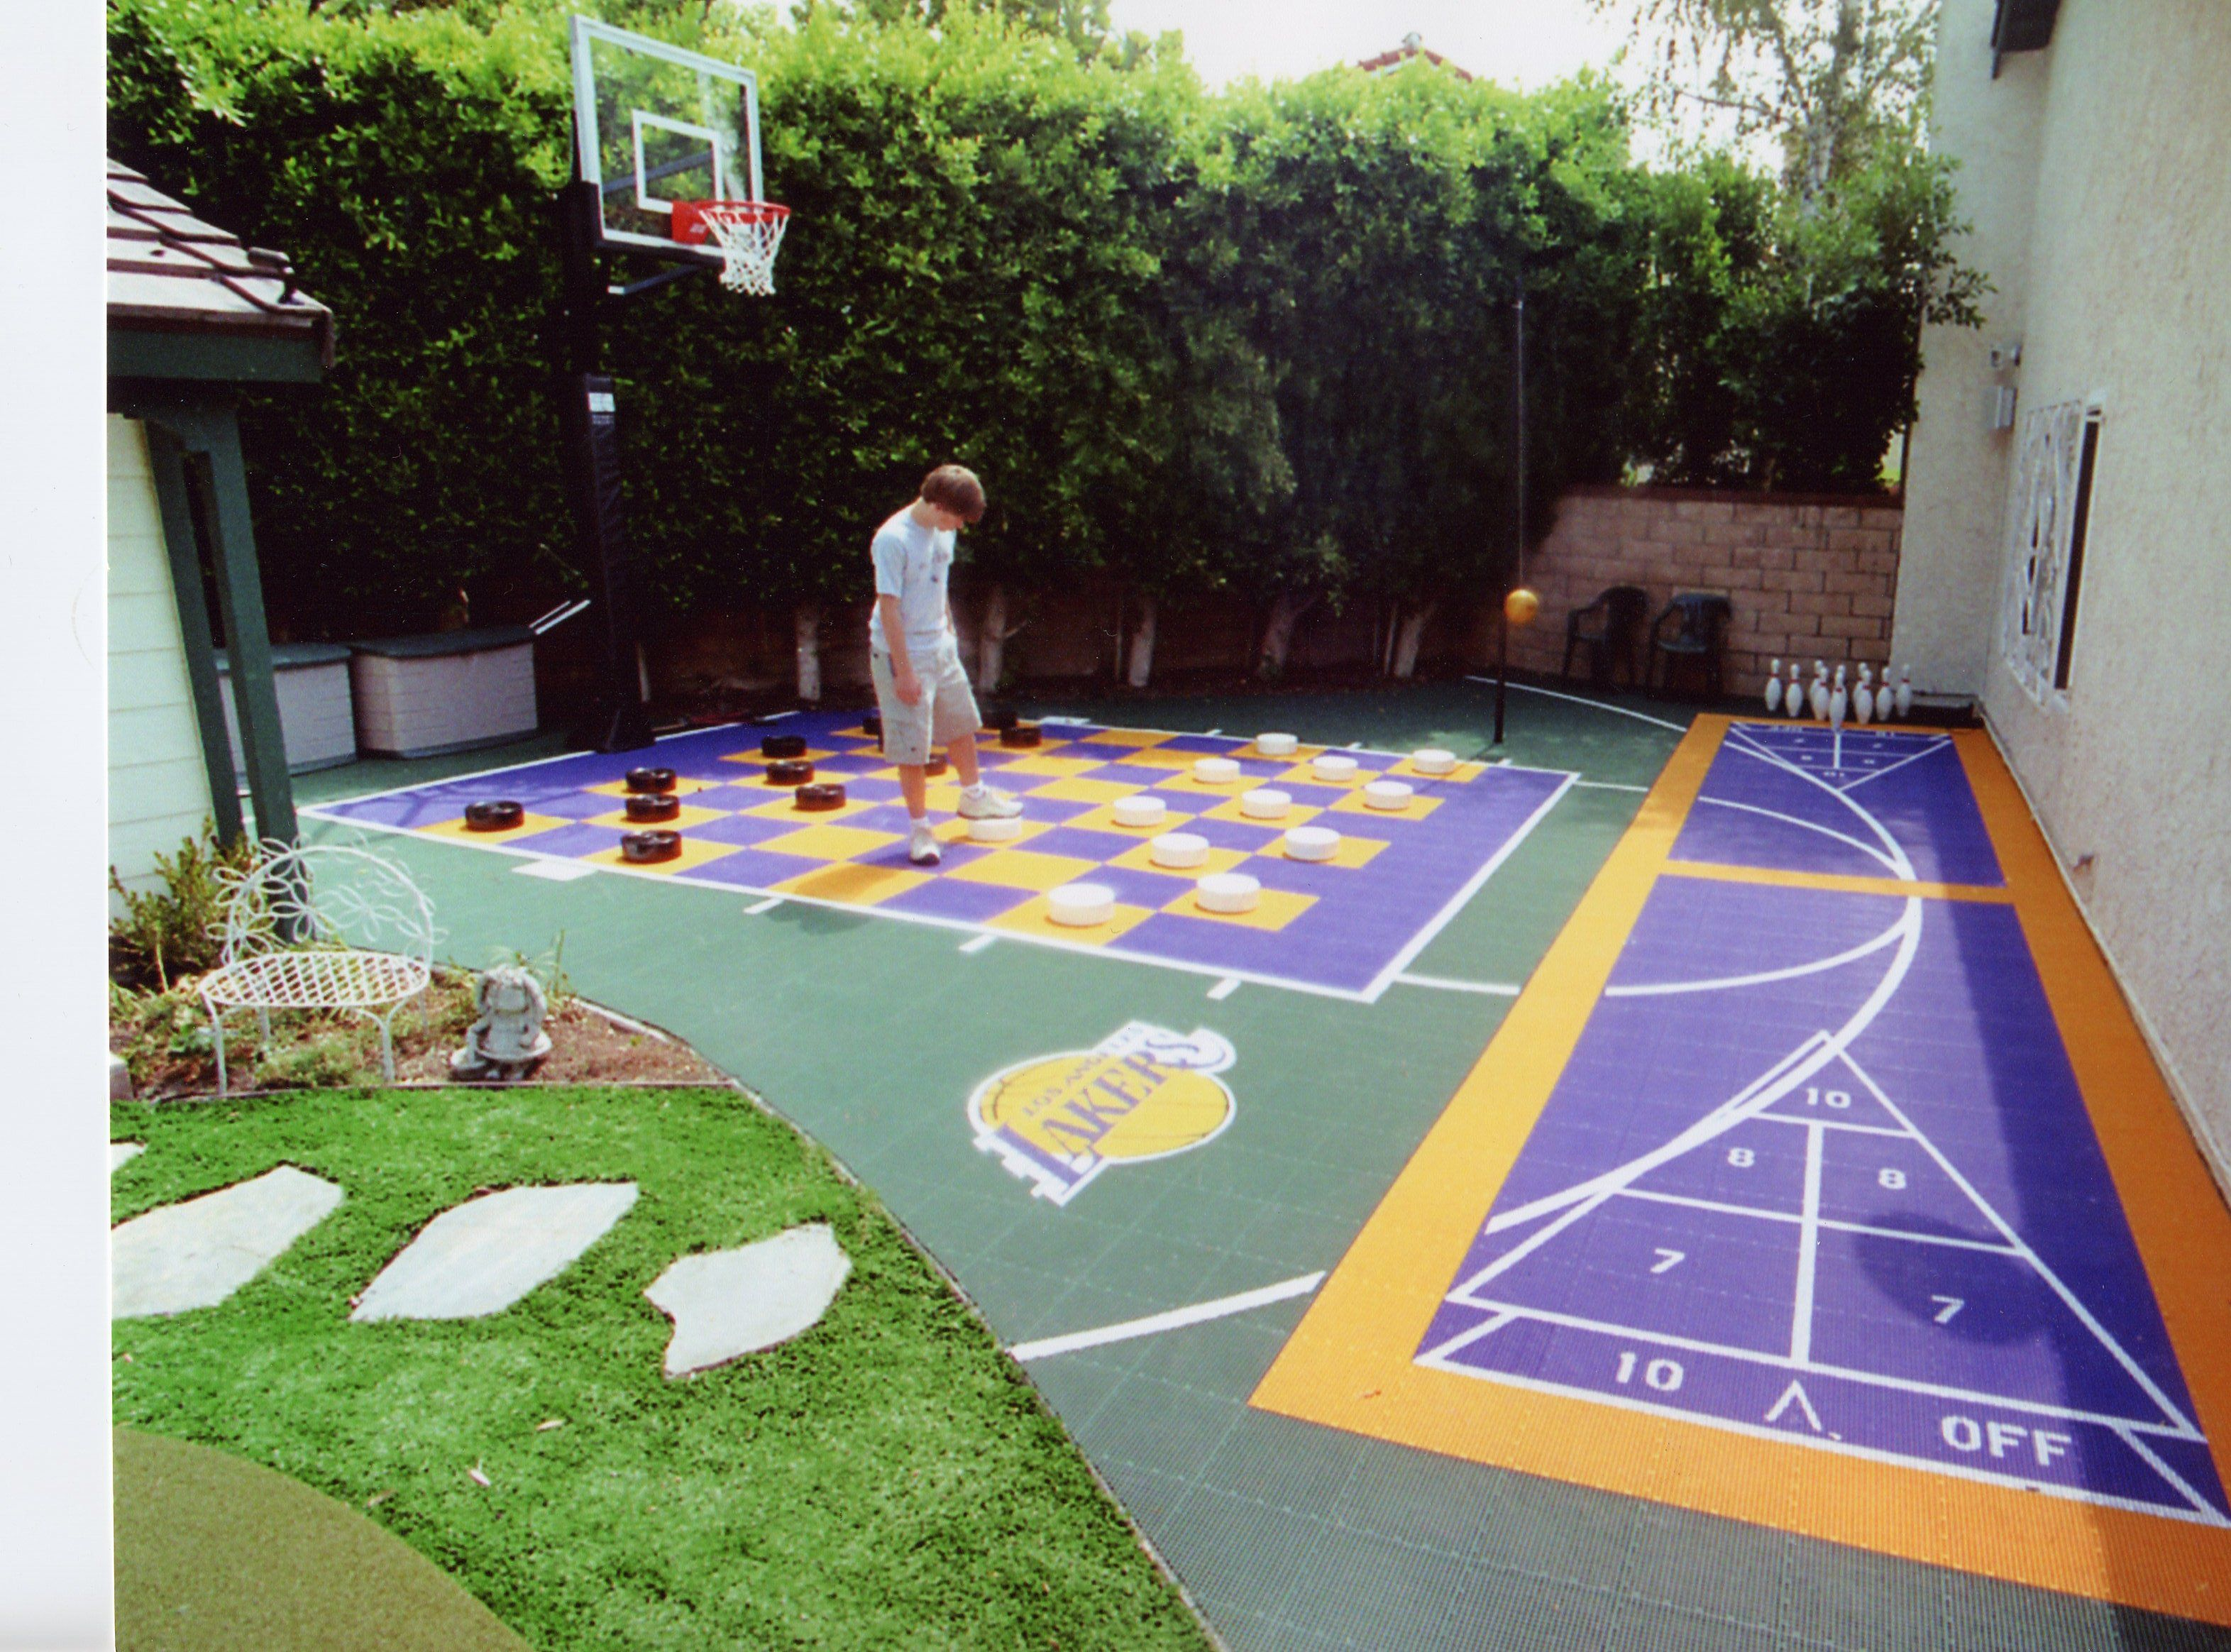 Backyard Sport Court Ideas pin it on pinterest backyard ideas sports field game court Find This Pin And More On Sport Court Backyard Courts